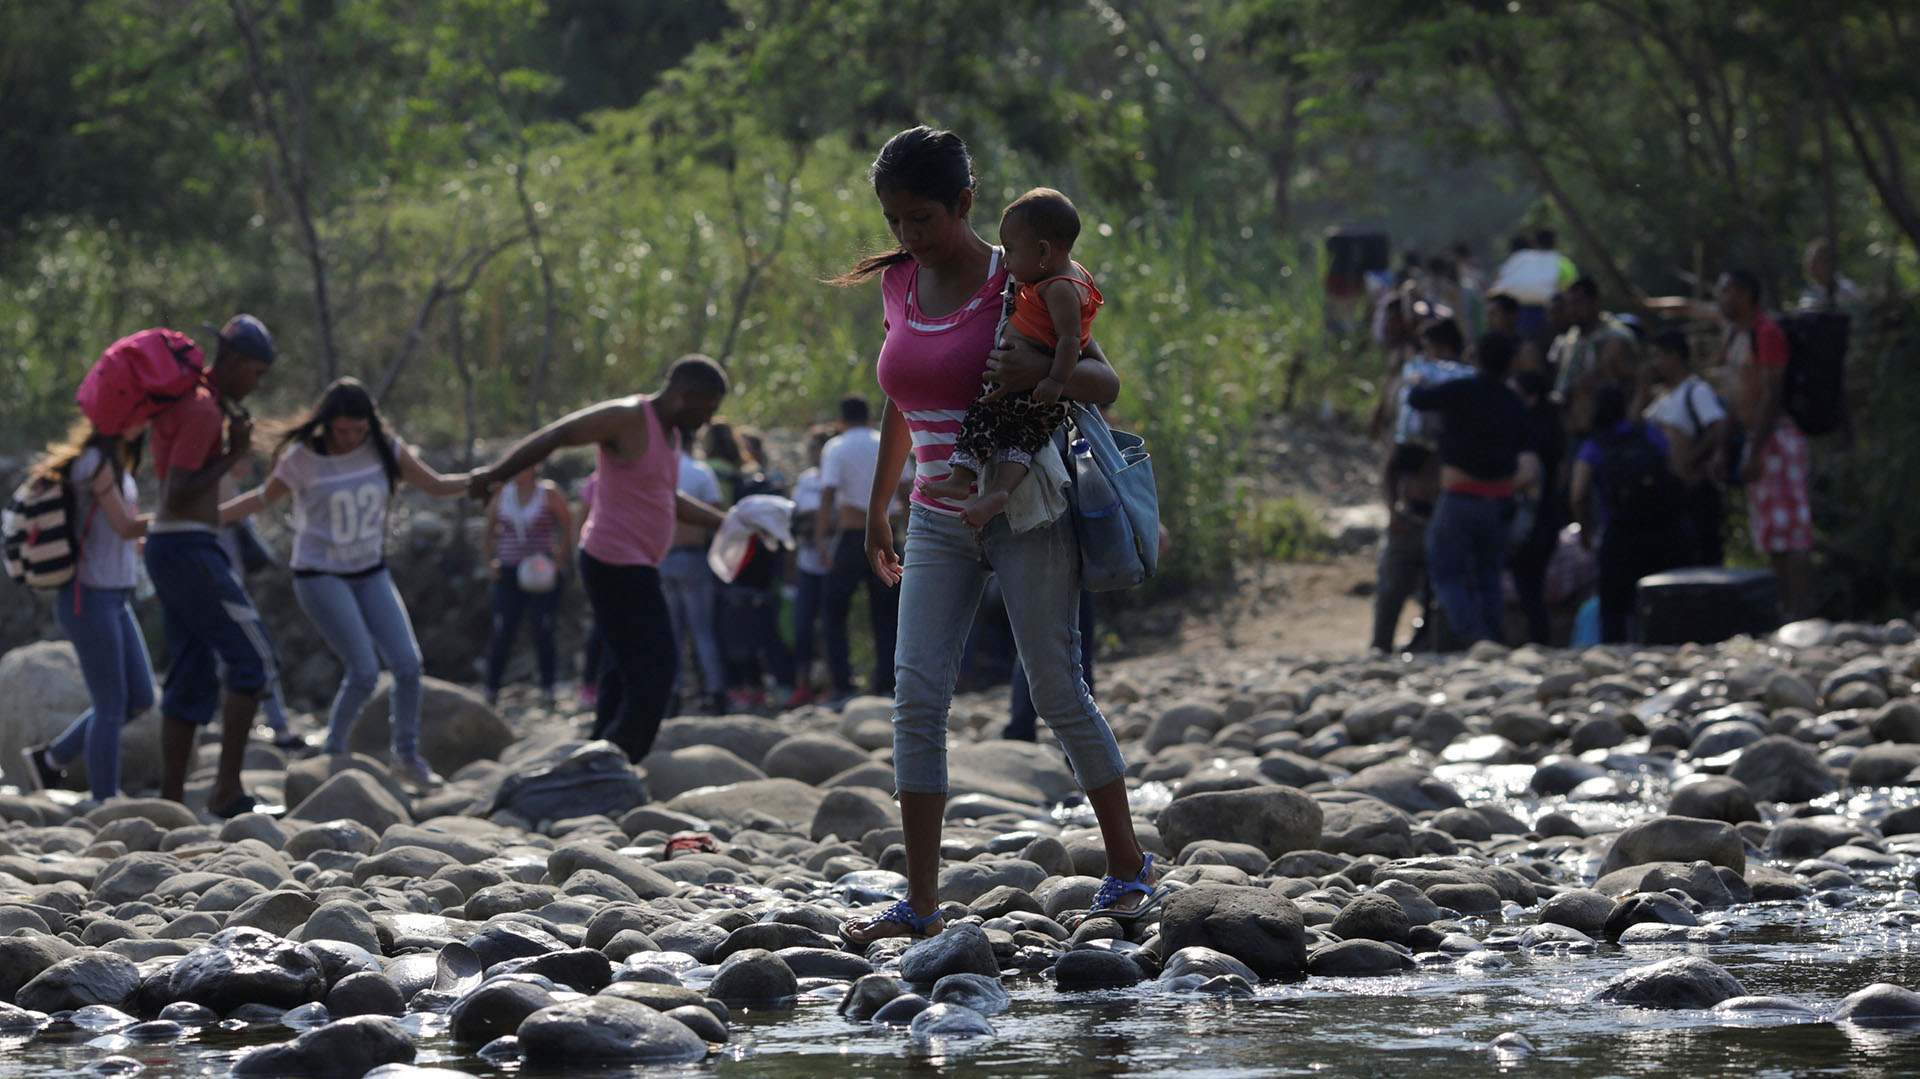 Vienen de pasar ronchar a contaminar al país — Maduro a trocheros